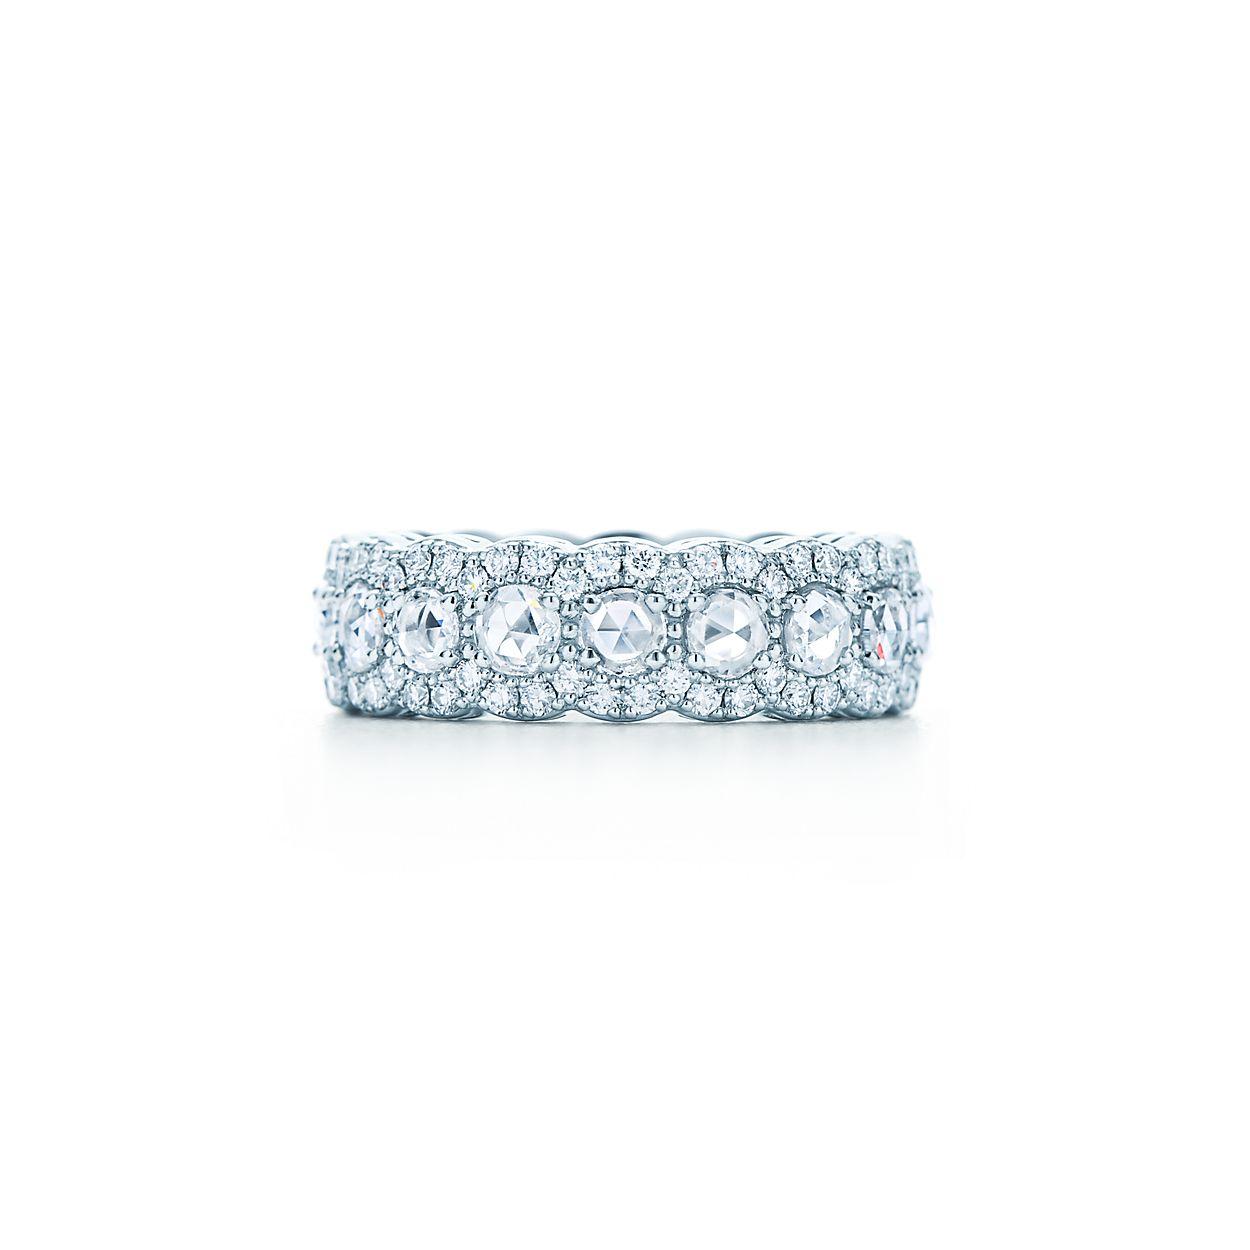 Tiffany Cobblestone band ring in platinum with diamonds. | Tiffany & Co.